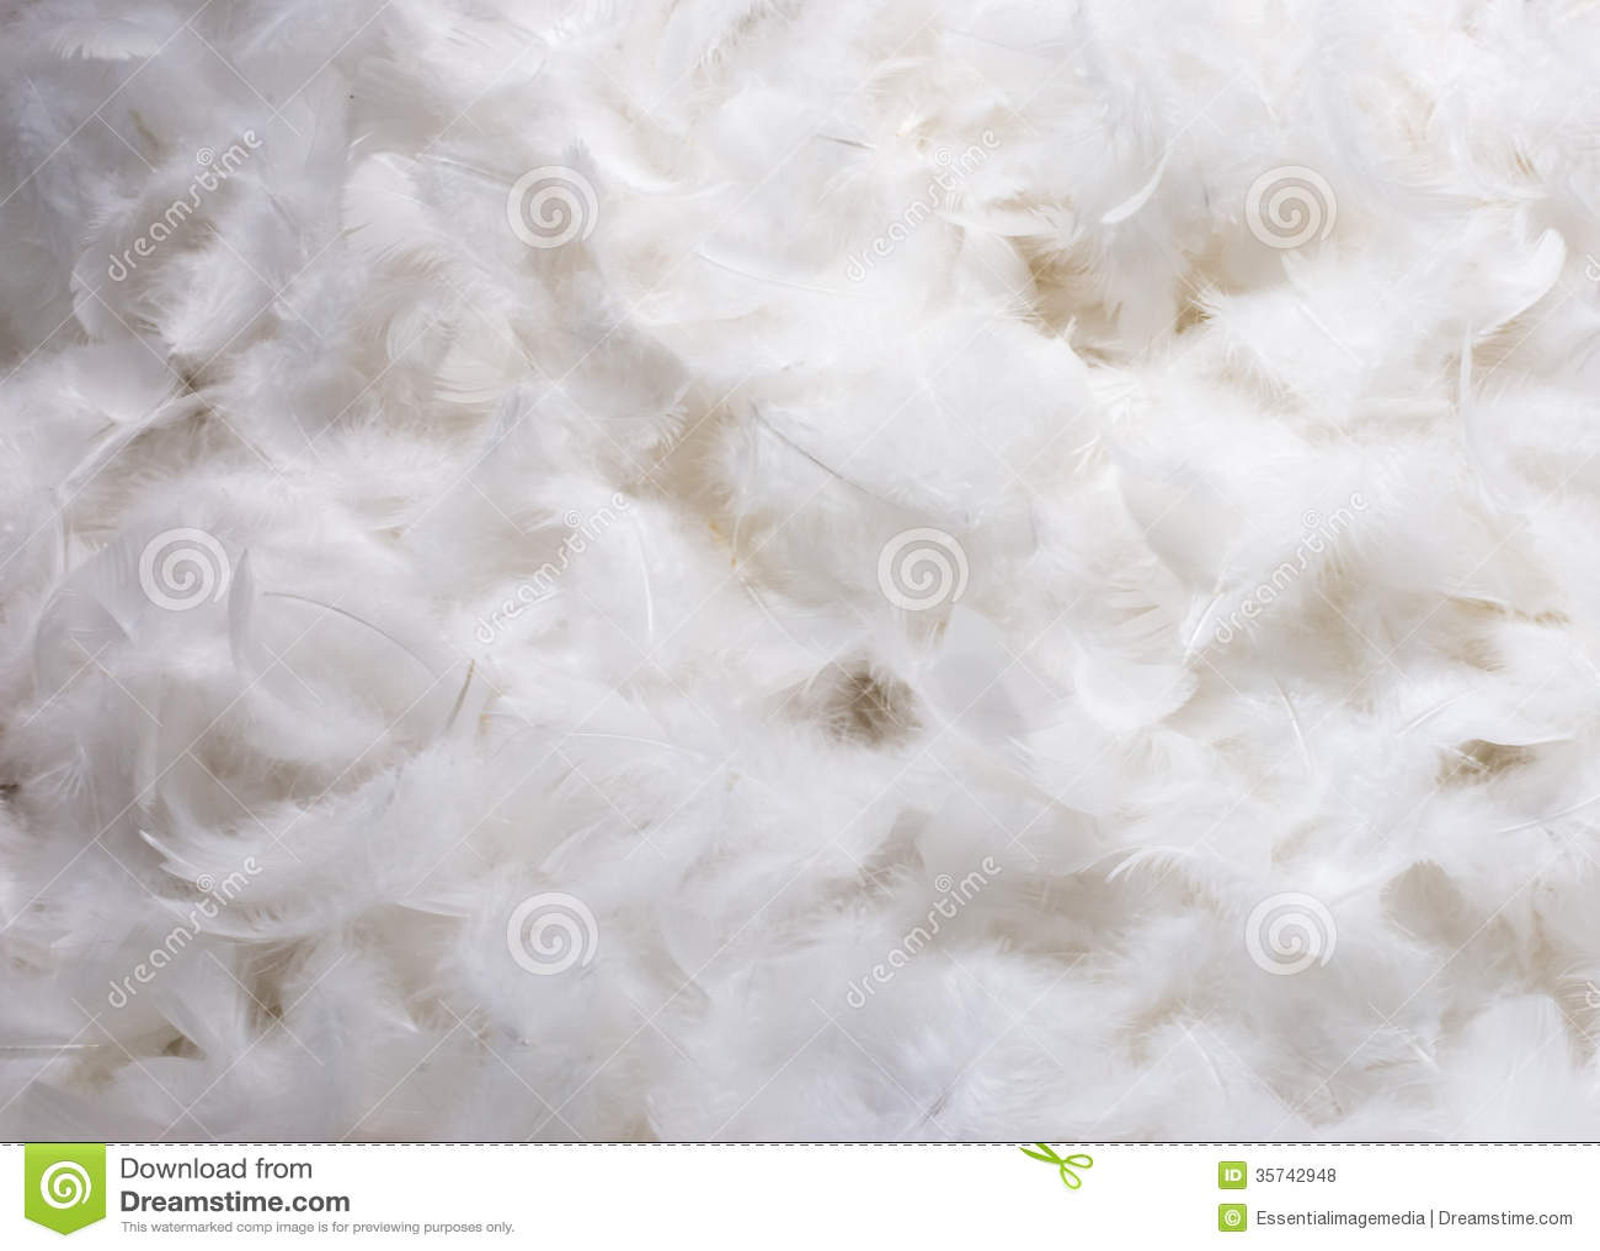 White Feathers Royalty Free Stock Photos Image 35742948